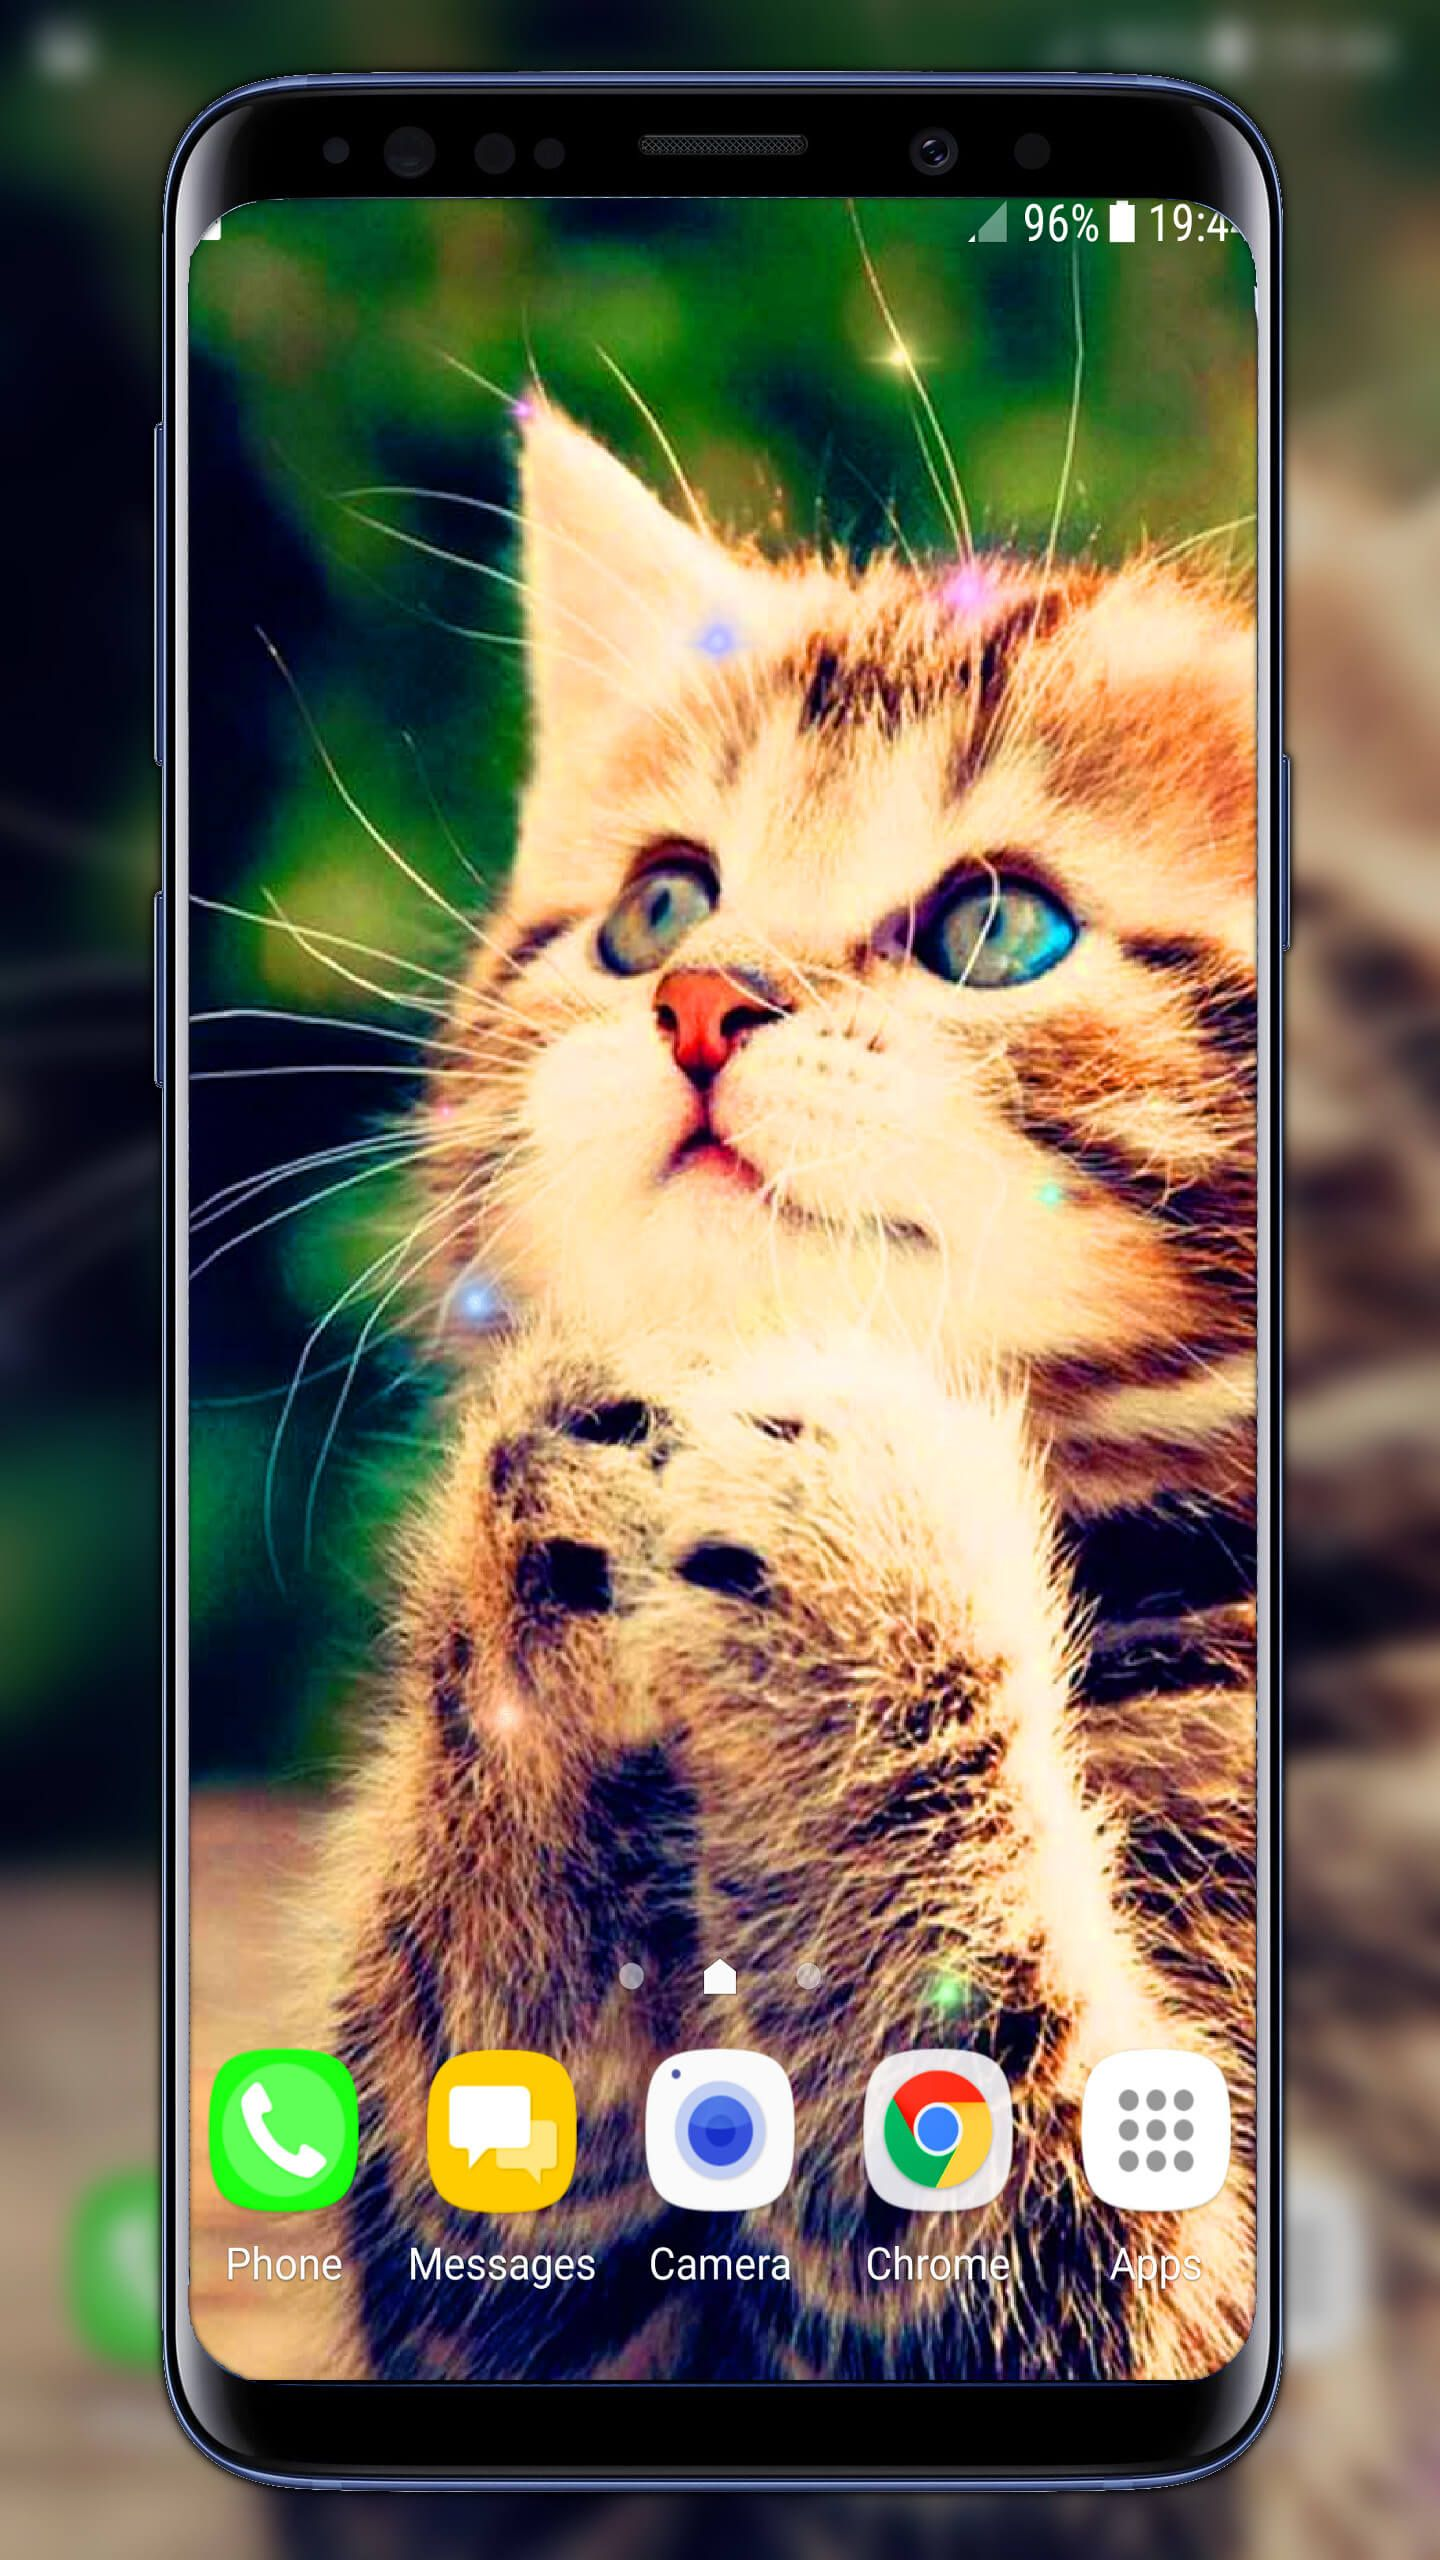 Kittens Live Wallpaper Kittens Cute Wallpaper Live Wallpapers Android Theme Wallpaper